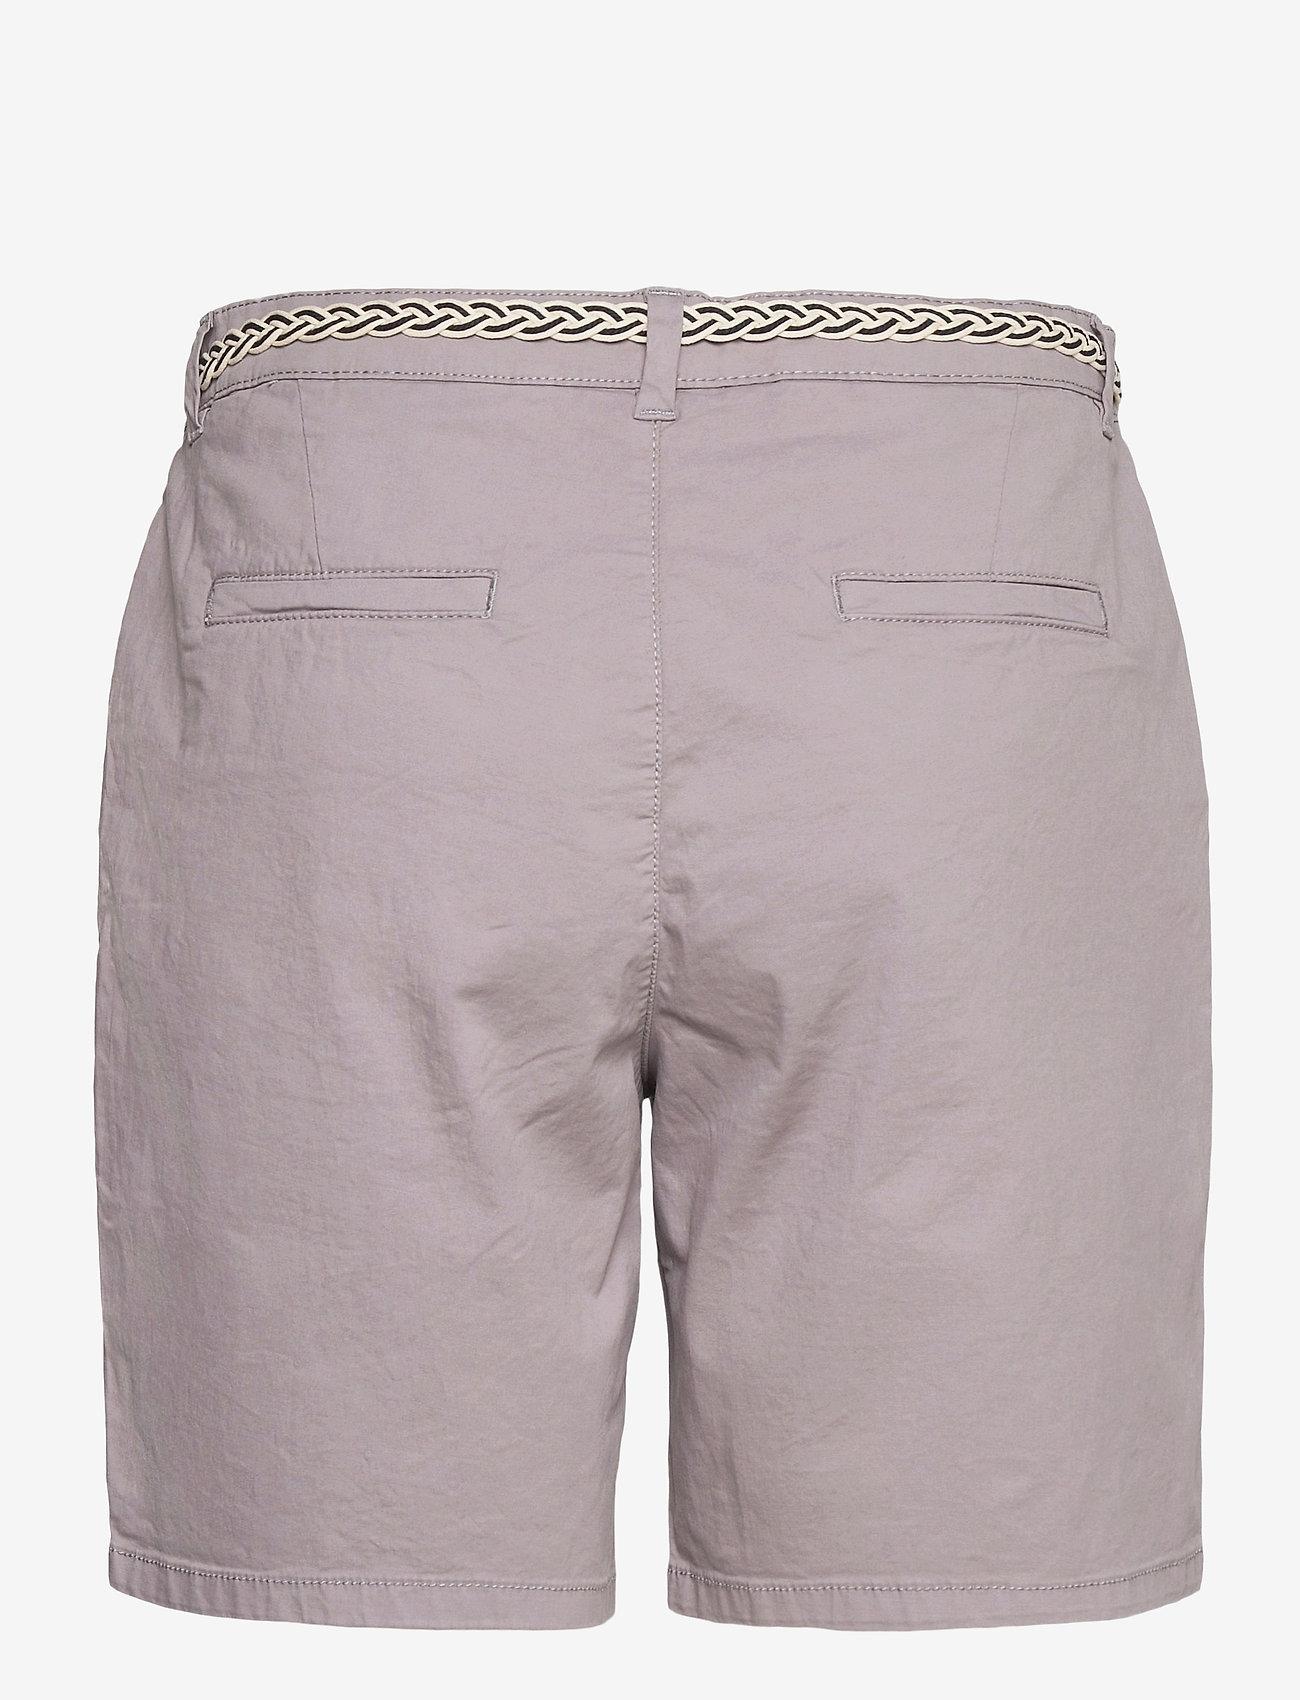 Esprit Casual - Shorts woven - chino shorts - light grey - 1